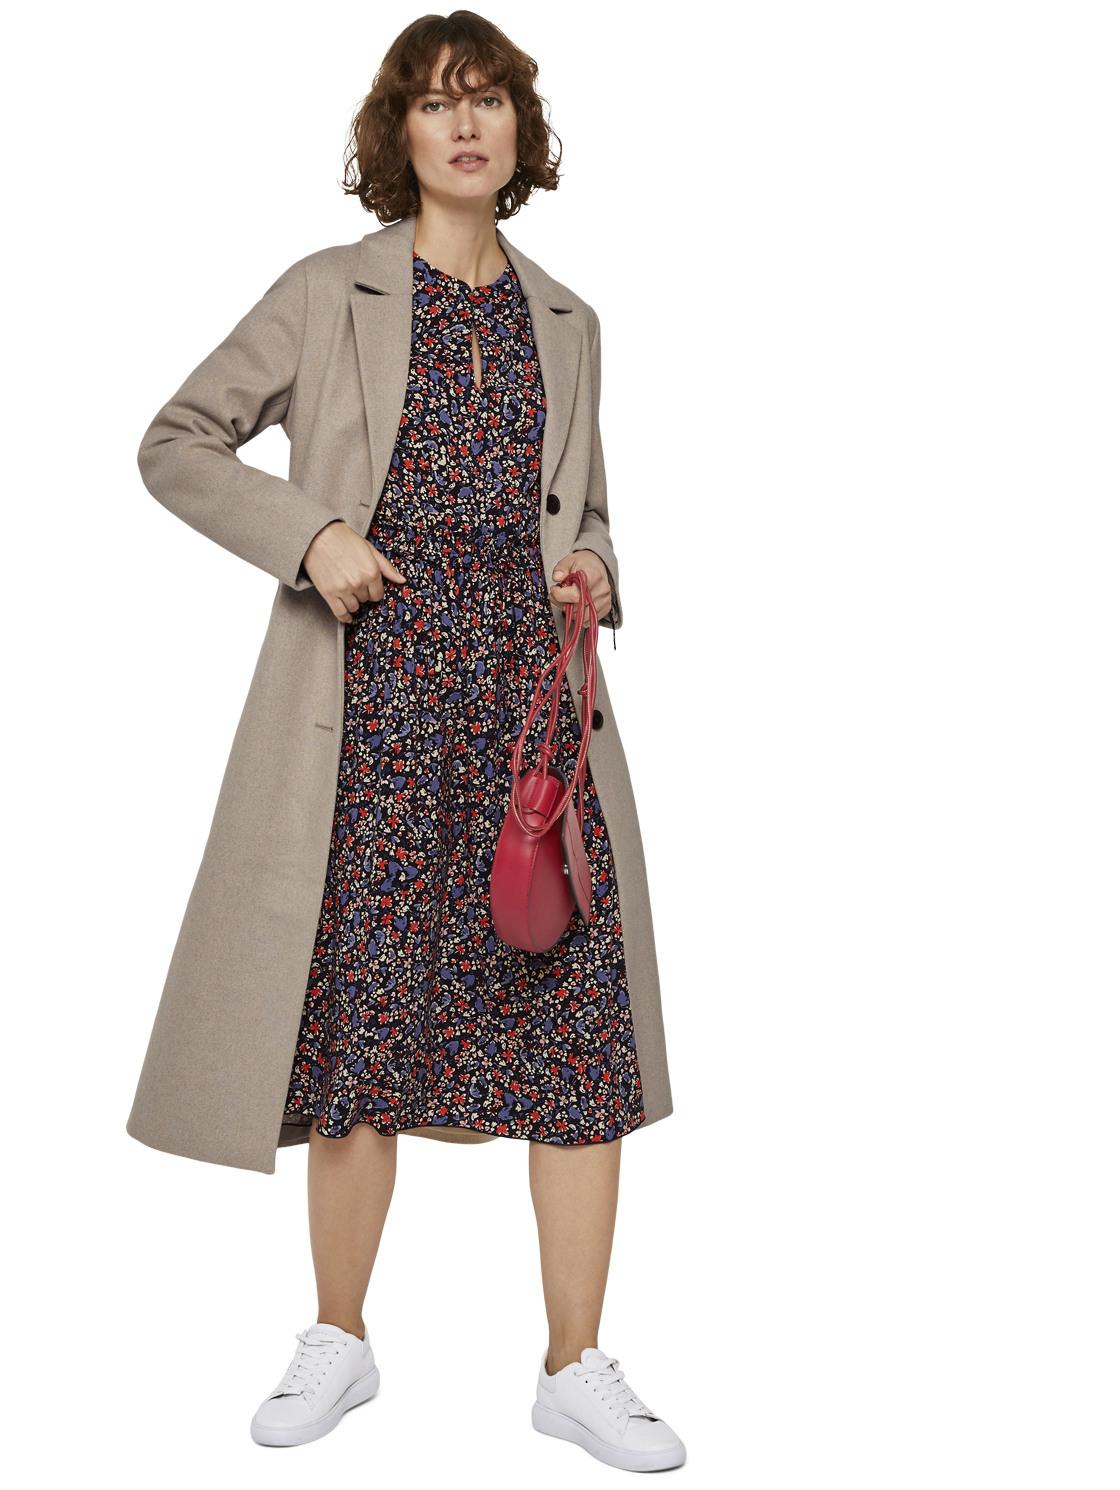 Tom Tailor Kleid 10599055 Kaufen  Wöhrl